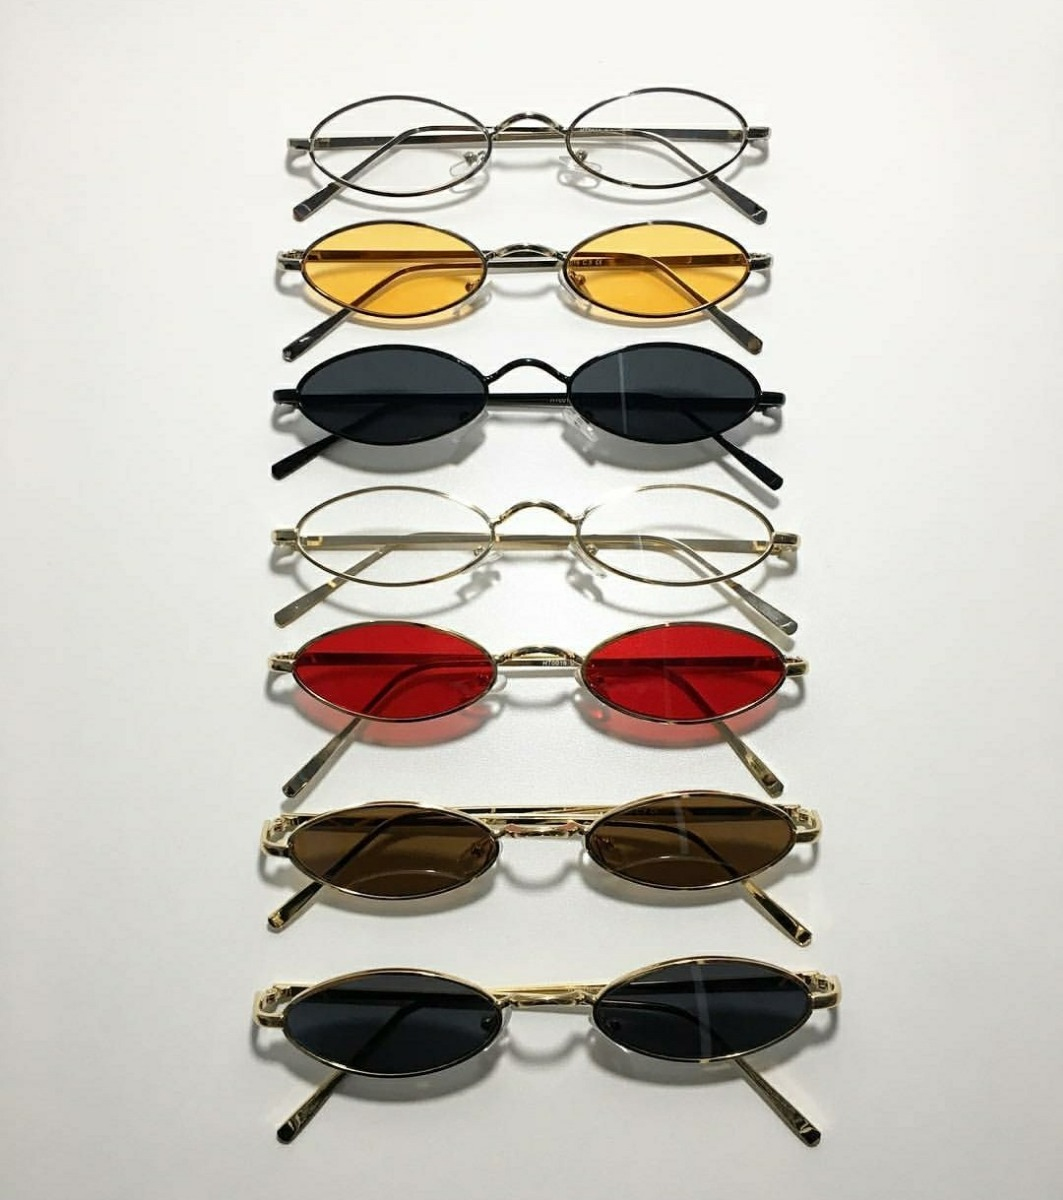 9cdeca193 Óculos Pequeno Quadrado Moda Tendencia Techno Hype Retro 90s - R$ 34 ...